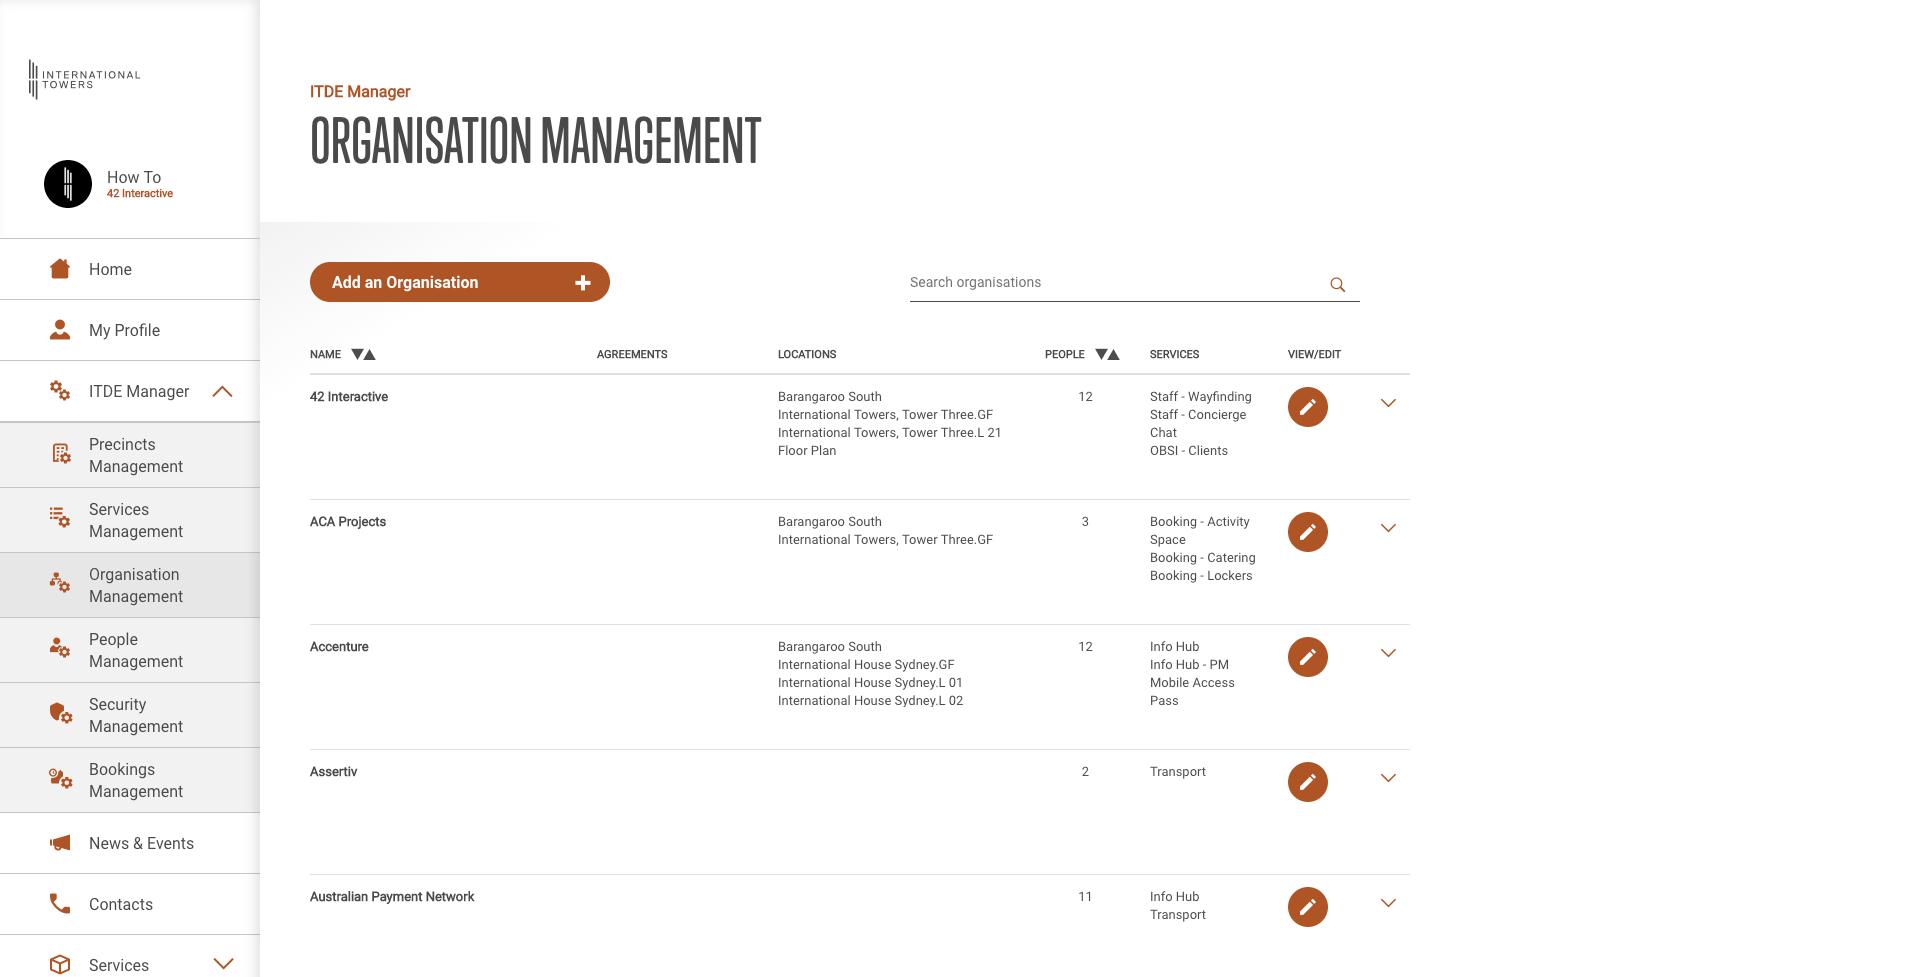 ITDE-organisationmanagement-list